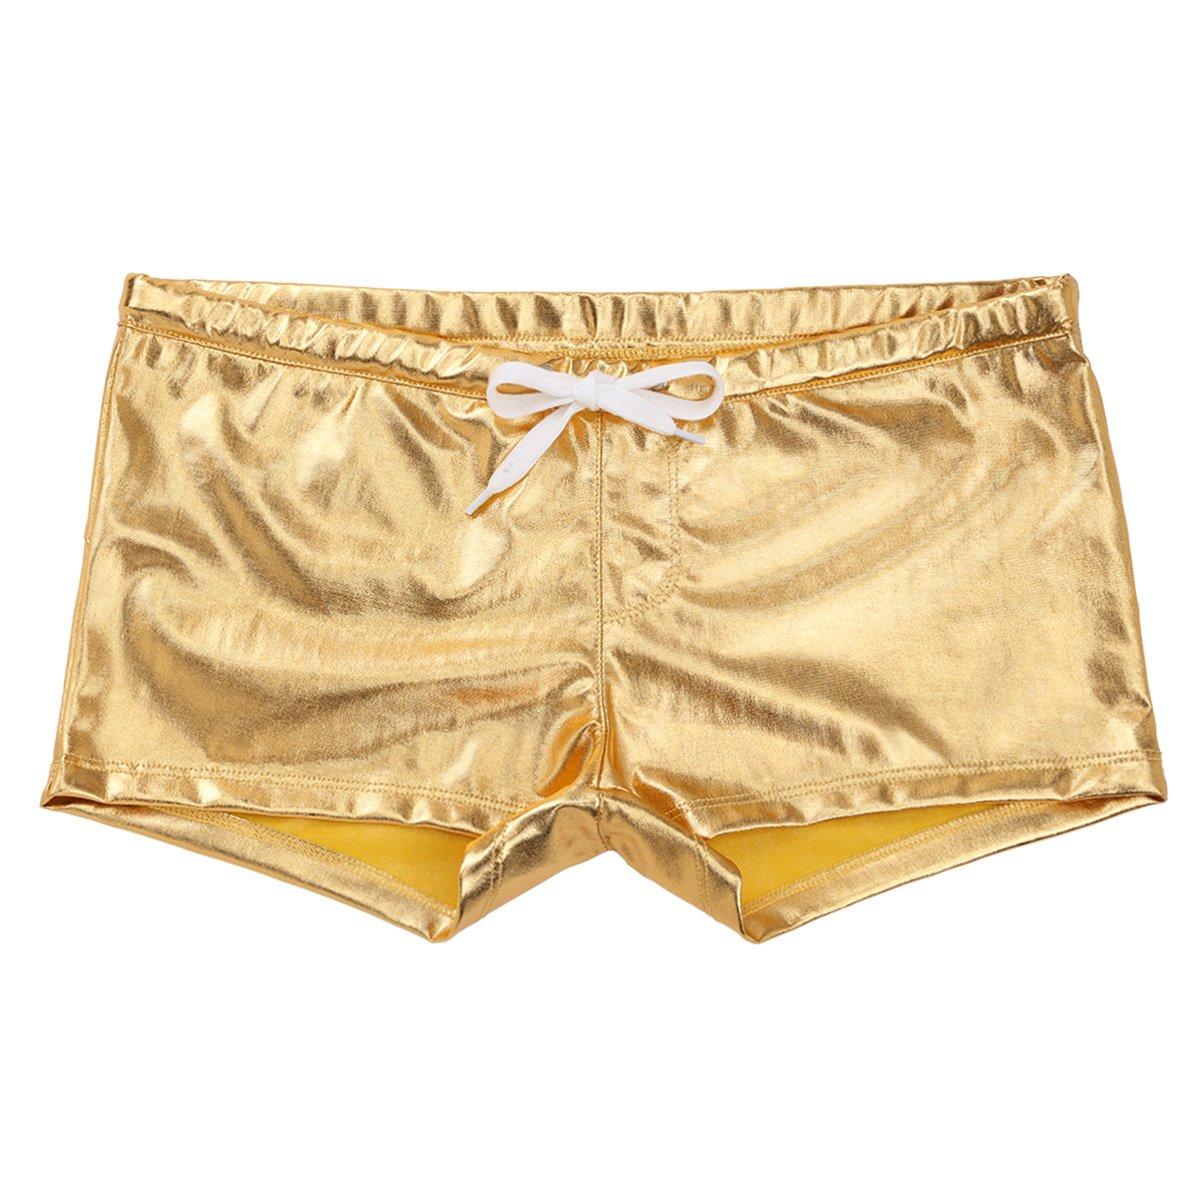 Freebily Men's Shiny Patent Leather Drawstring Lounge Underwear Boxer Shorts